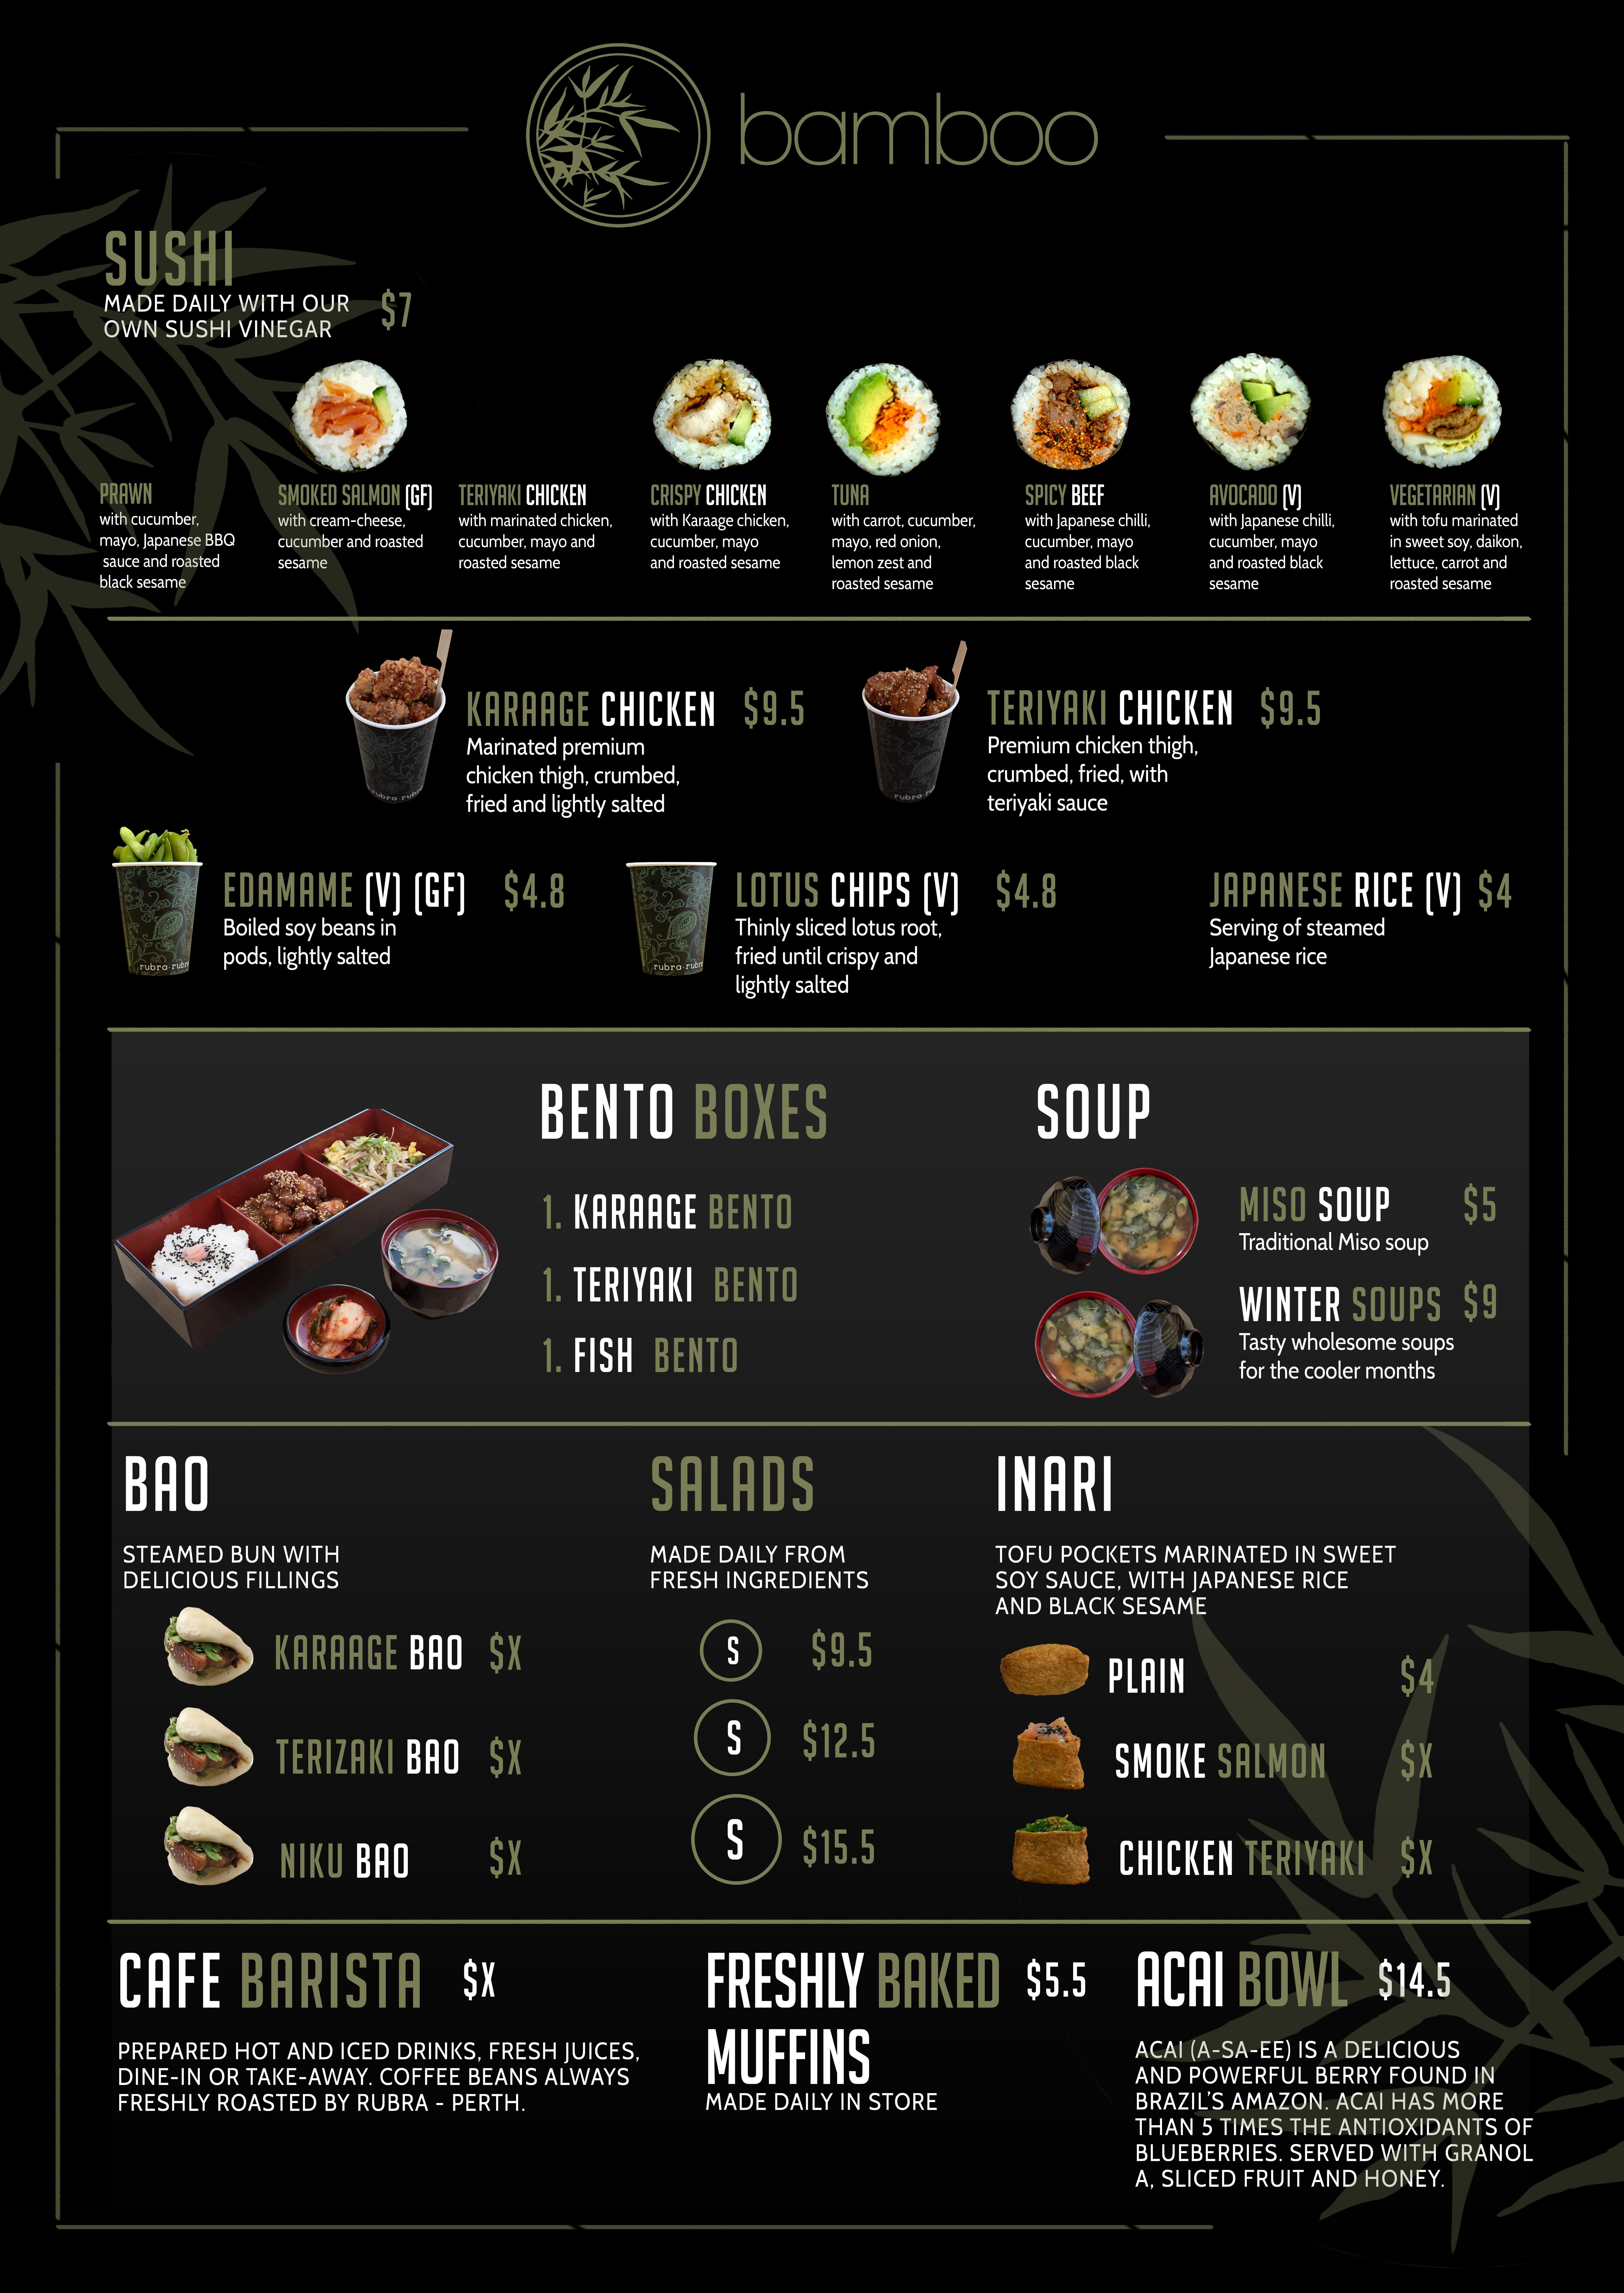 bamboo sushi shop menu board